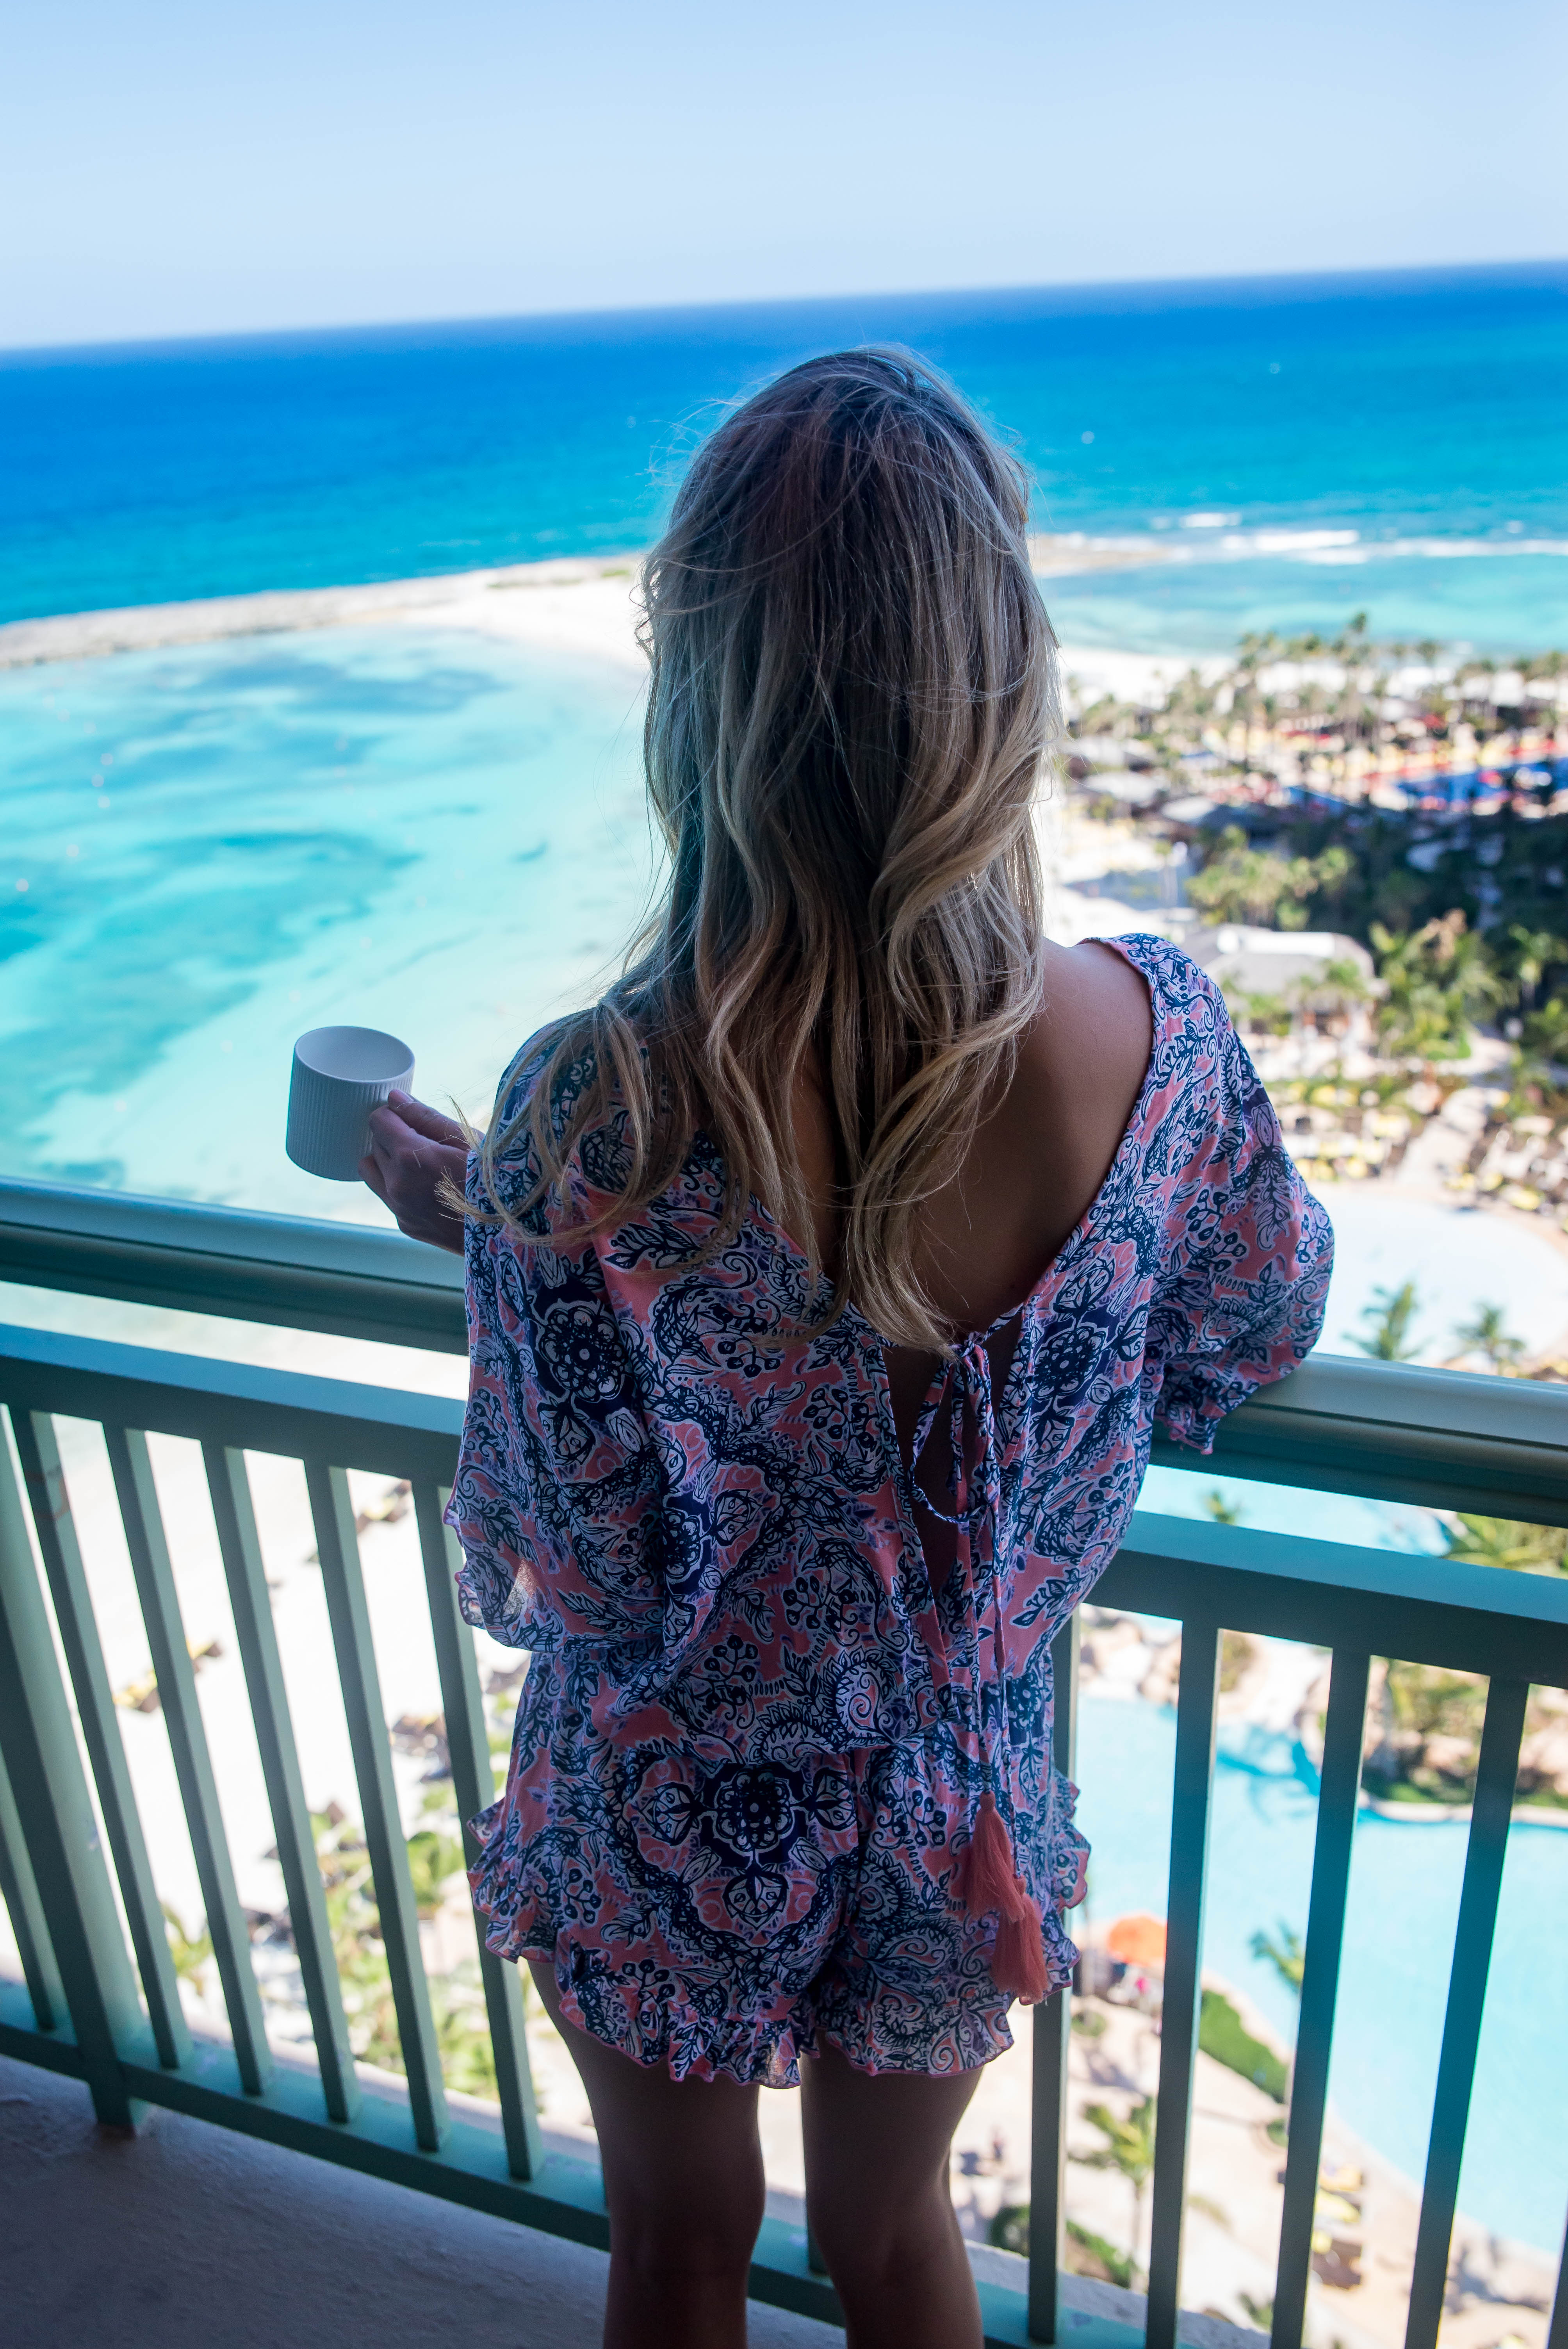 Atlantis Paradise Island Resort Review & Photo Diary